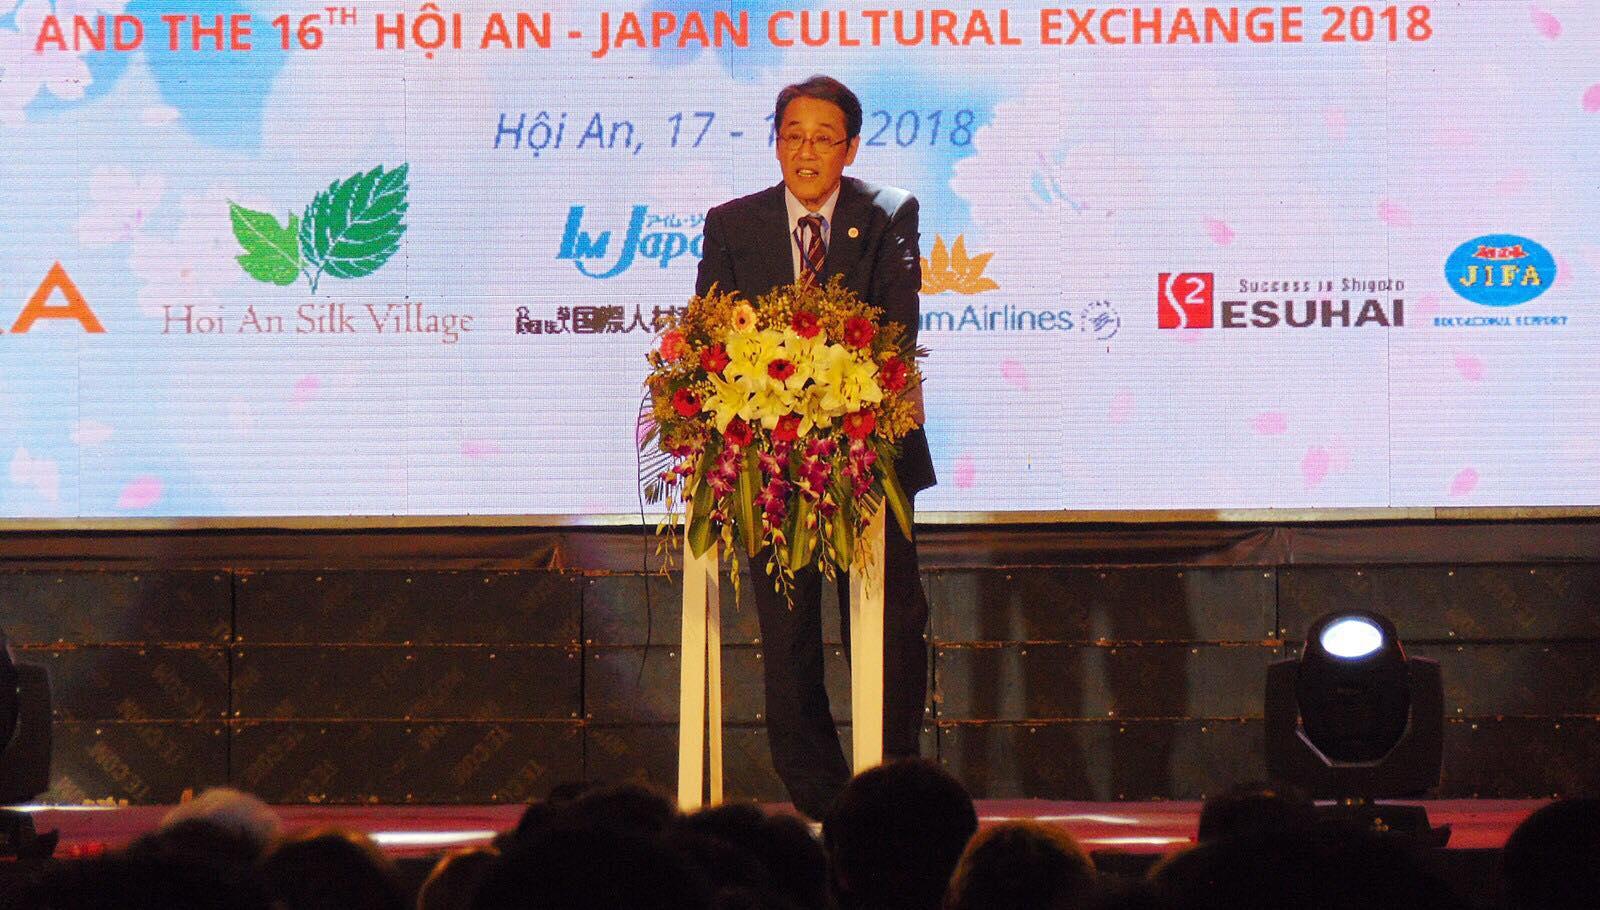 Japanese Ambassador Umeda Kunio speaks at the opening ceremony